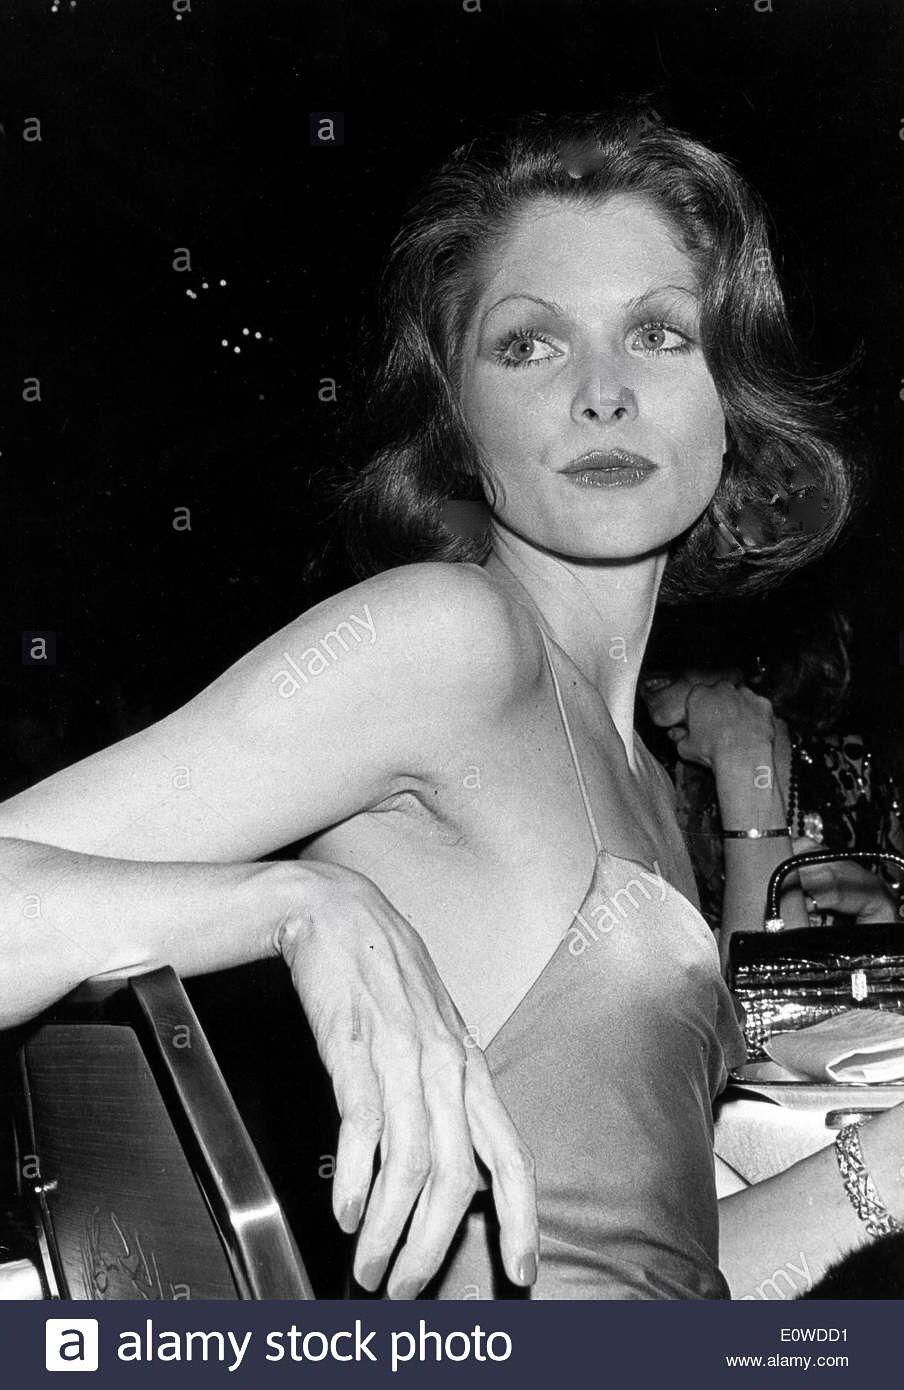 Lois Chiles nude (72 photo), Ass, Bikini, Boobs, butt 2018